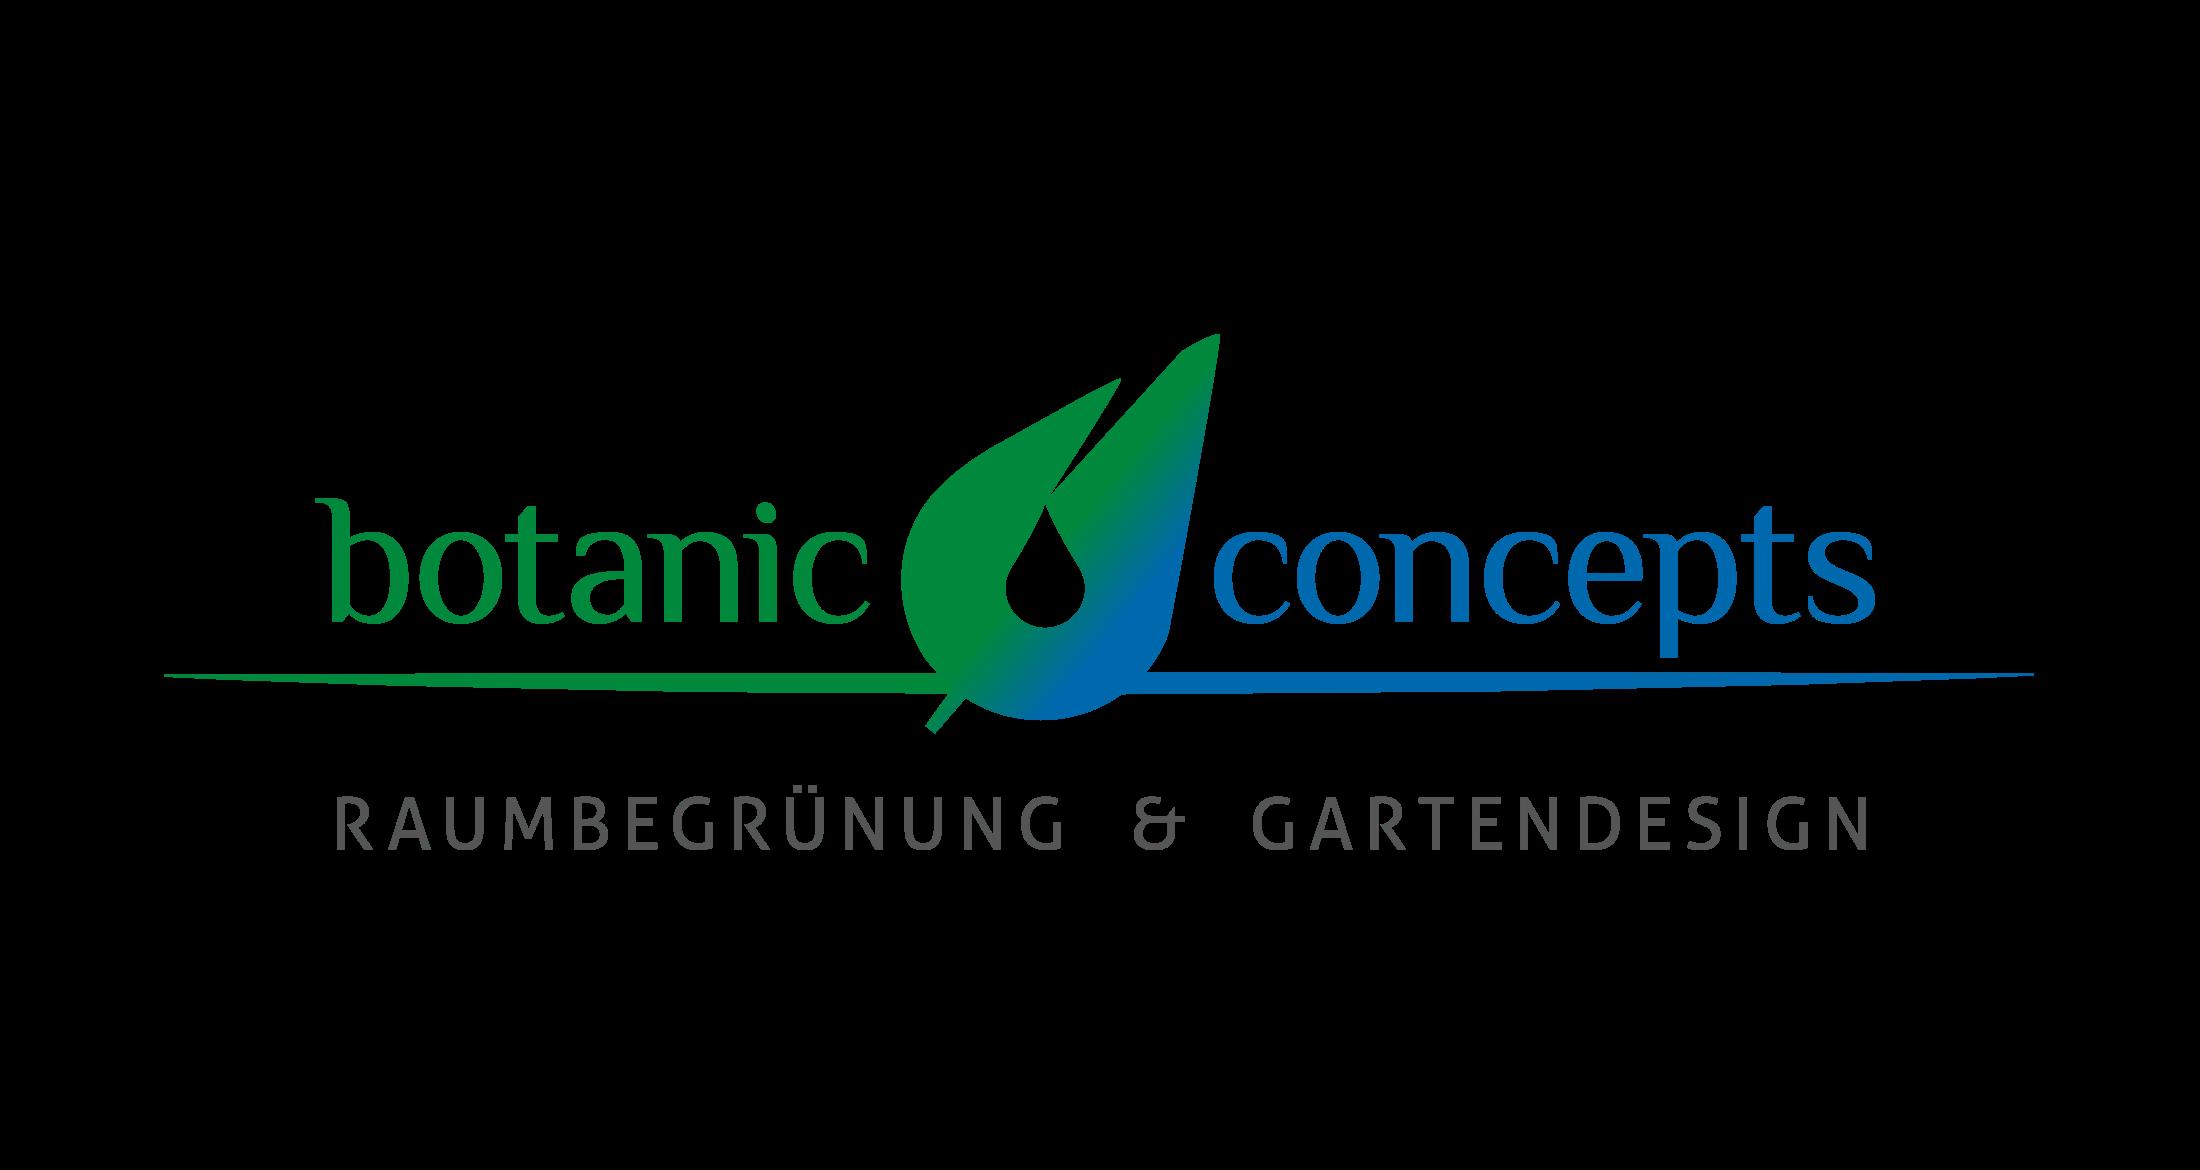 Logodesign botanic concepts, Dannenfels